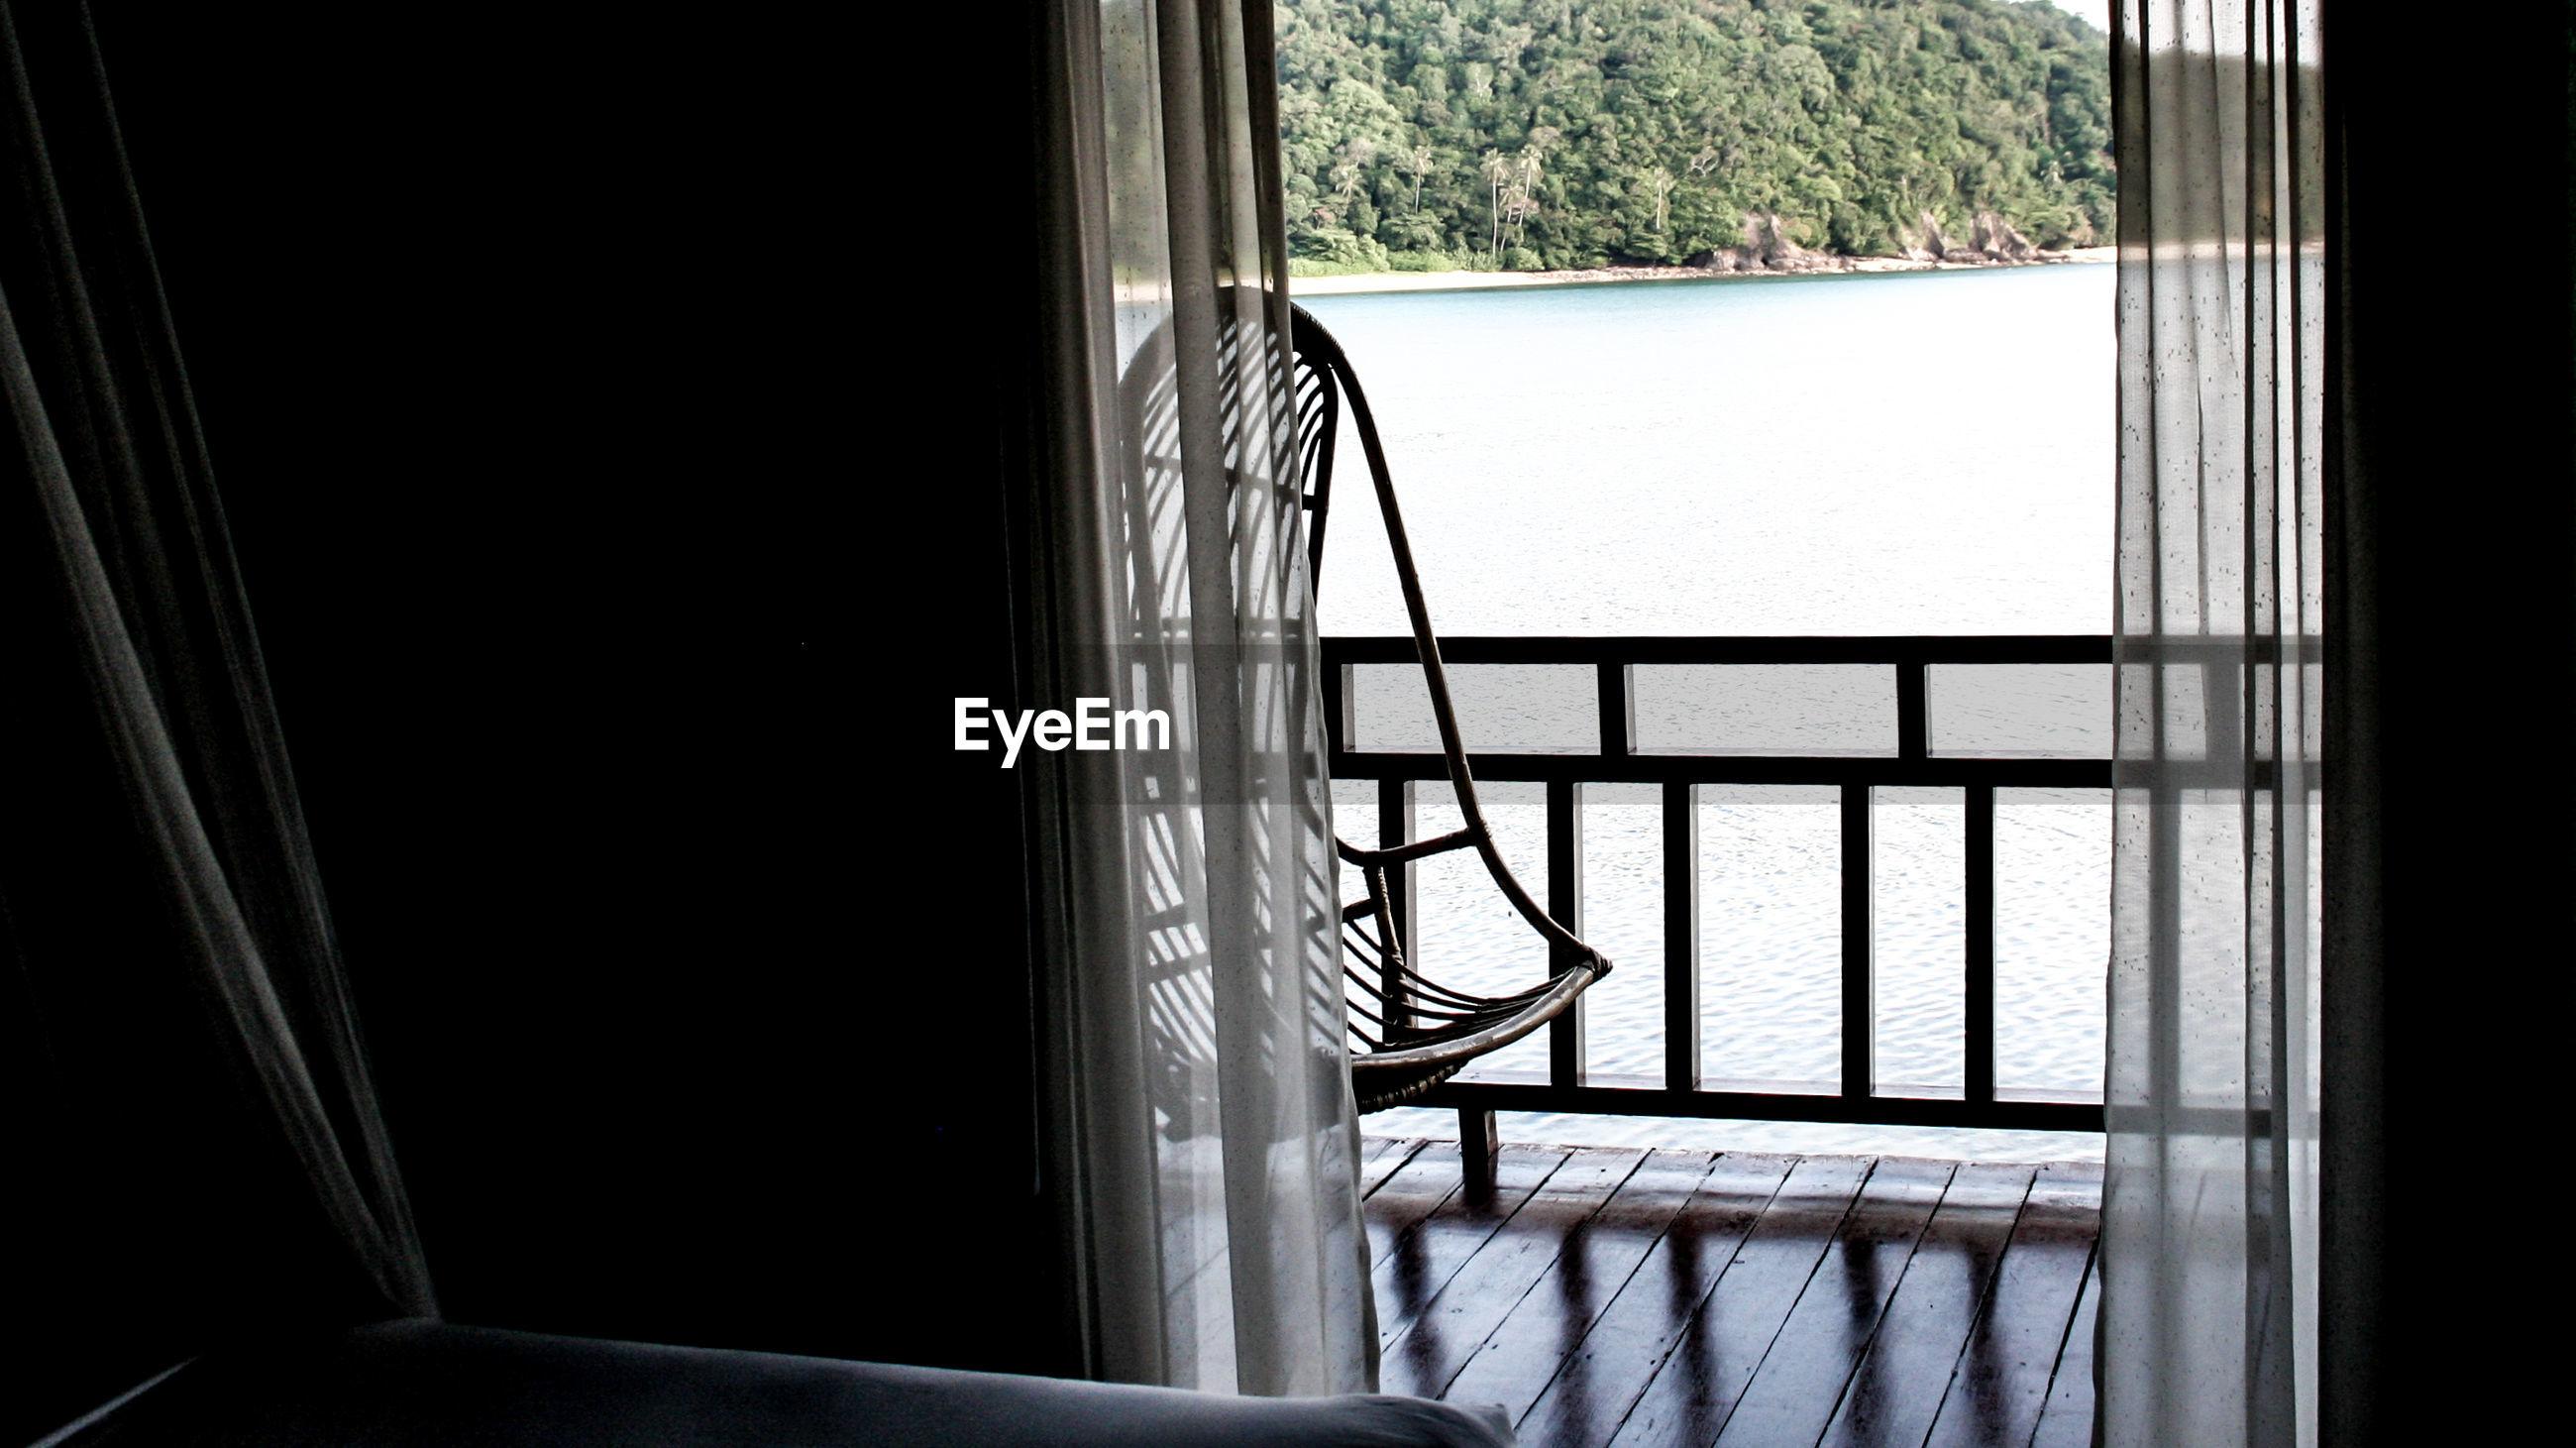 Balcony seen through window at home